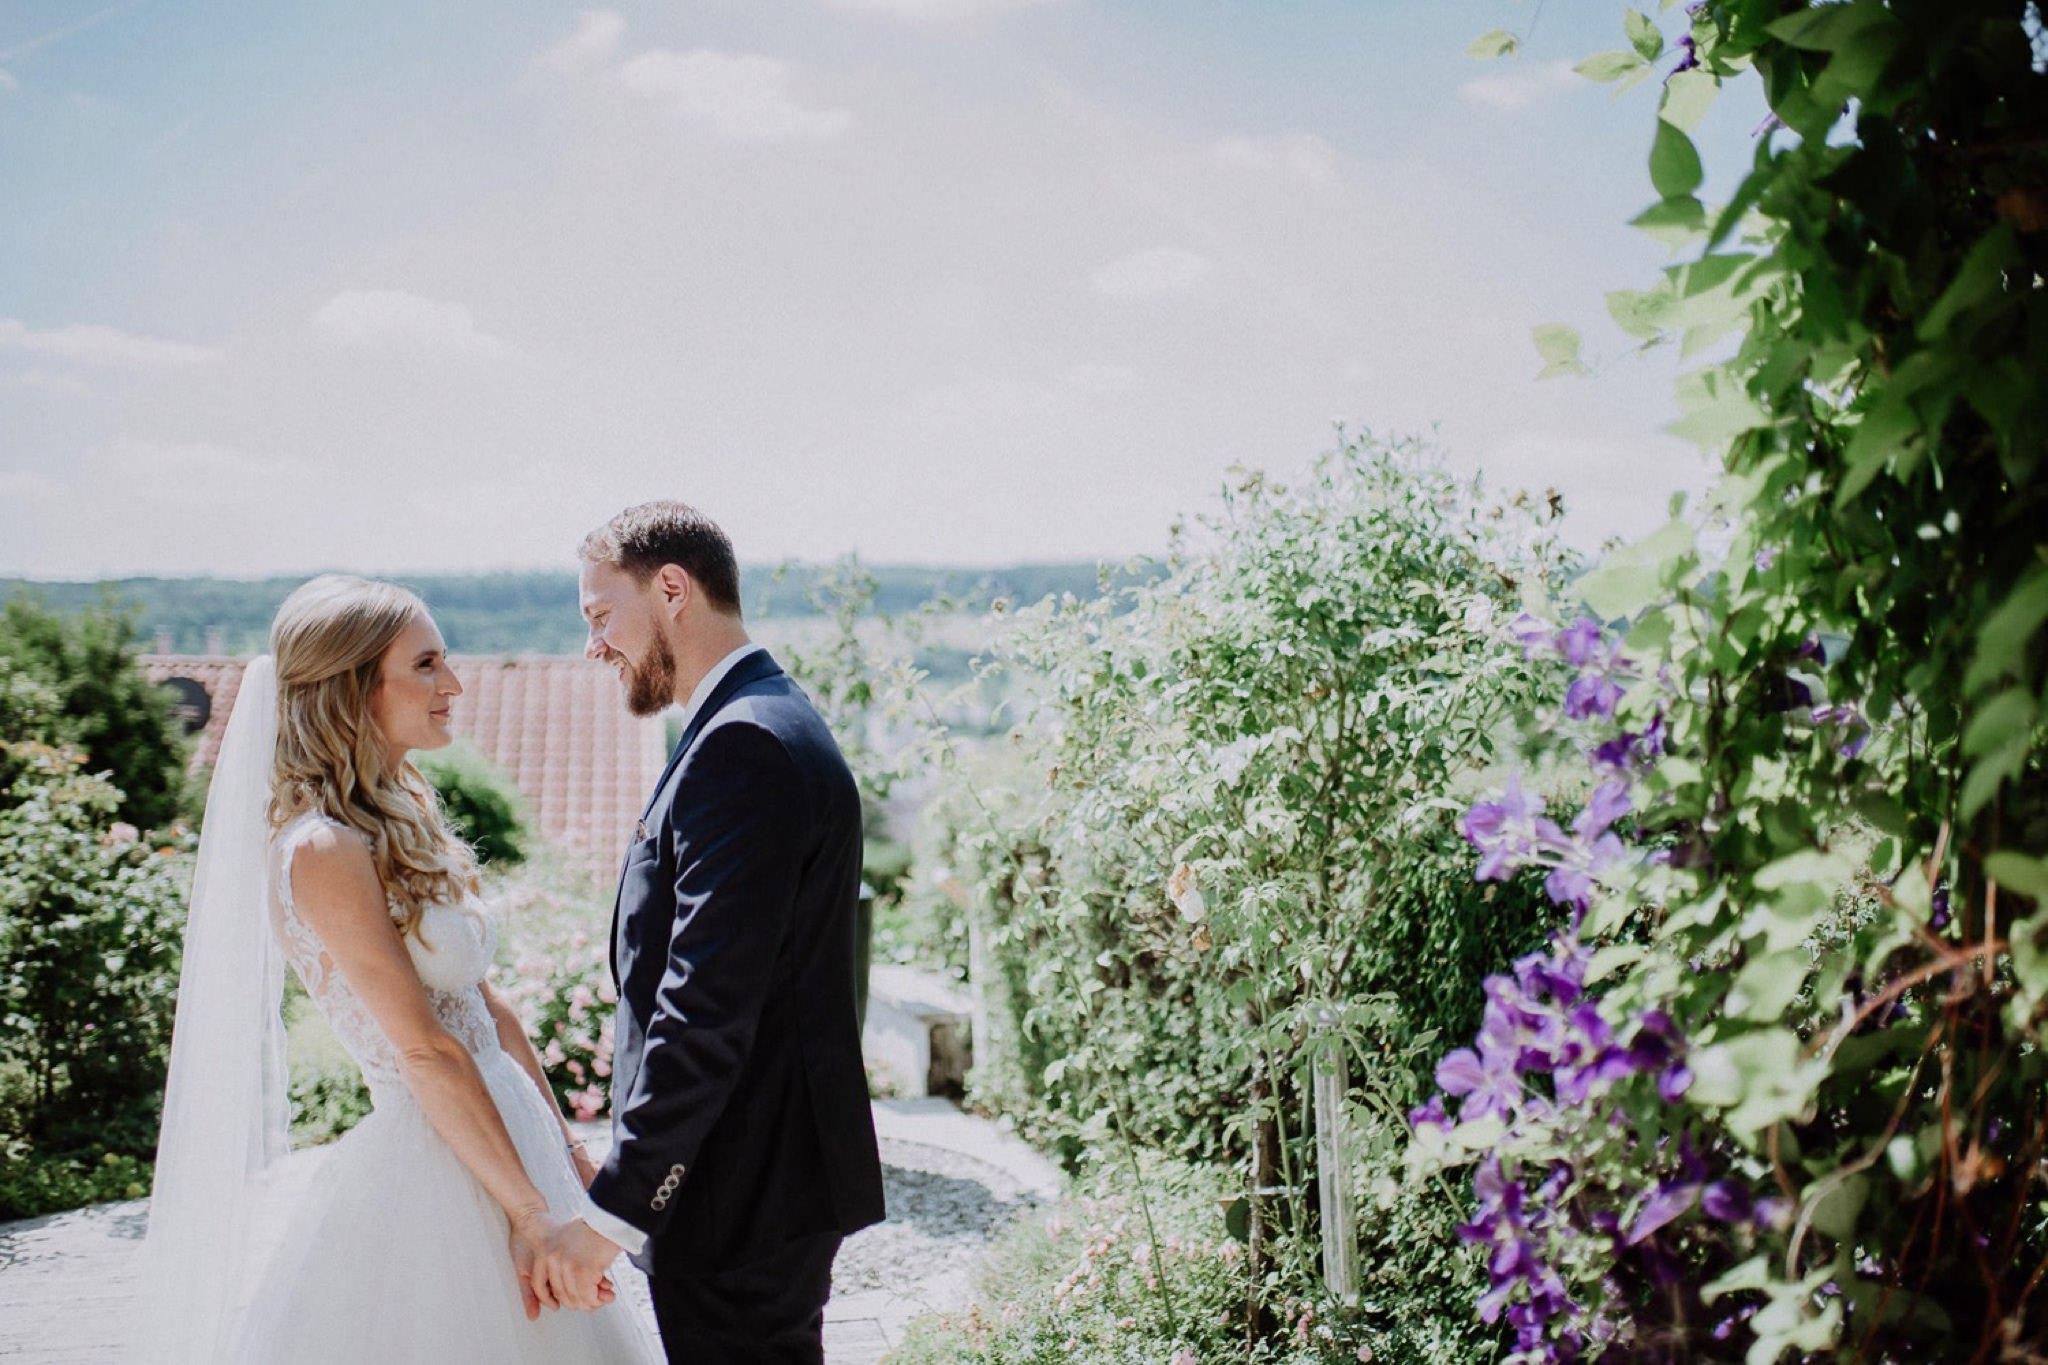 wedding photographer hamilton new zealand 1010 2